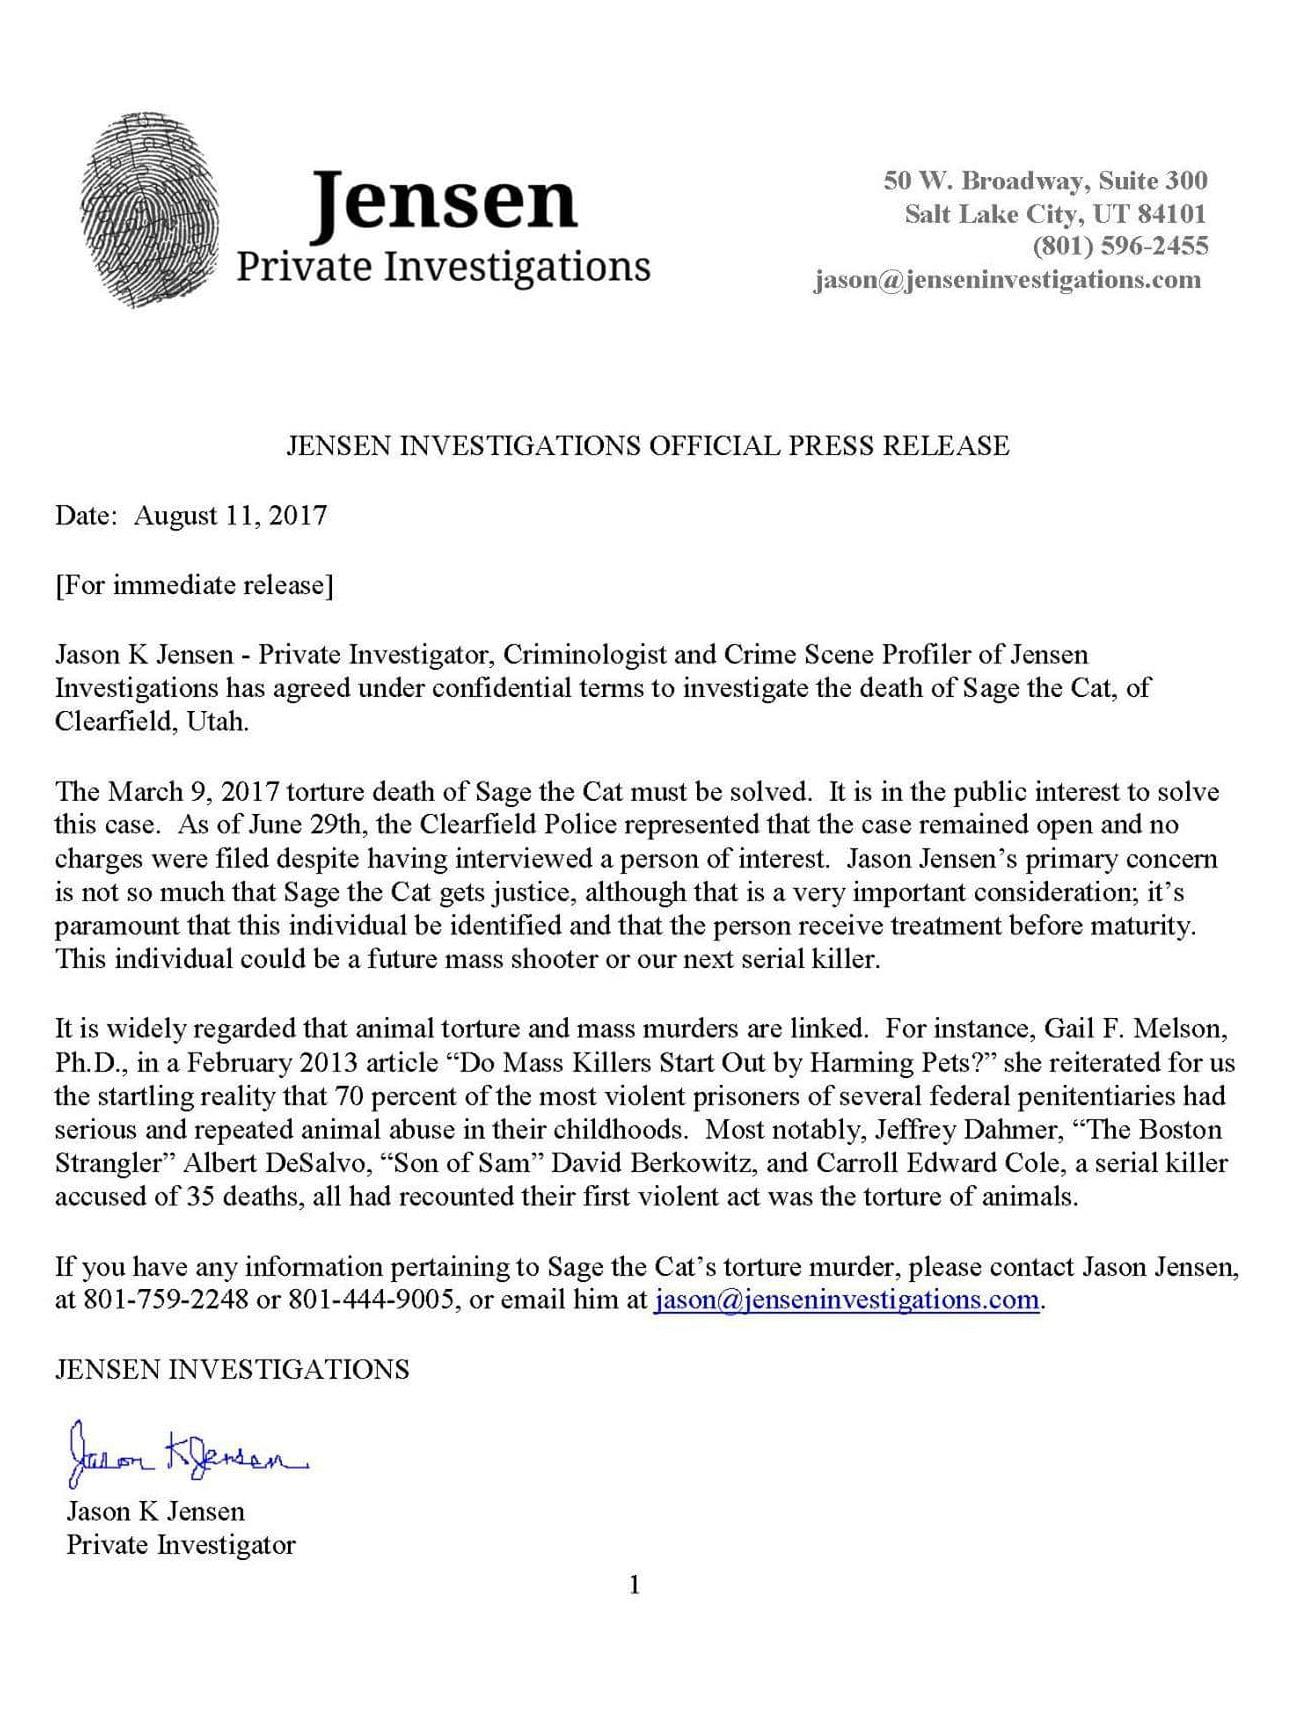 Private investigator's press release declaring his involvement in the investigation of Sage's torture